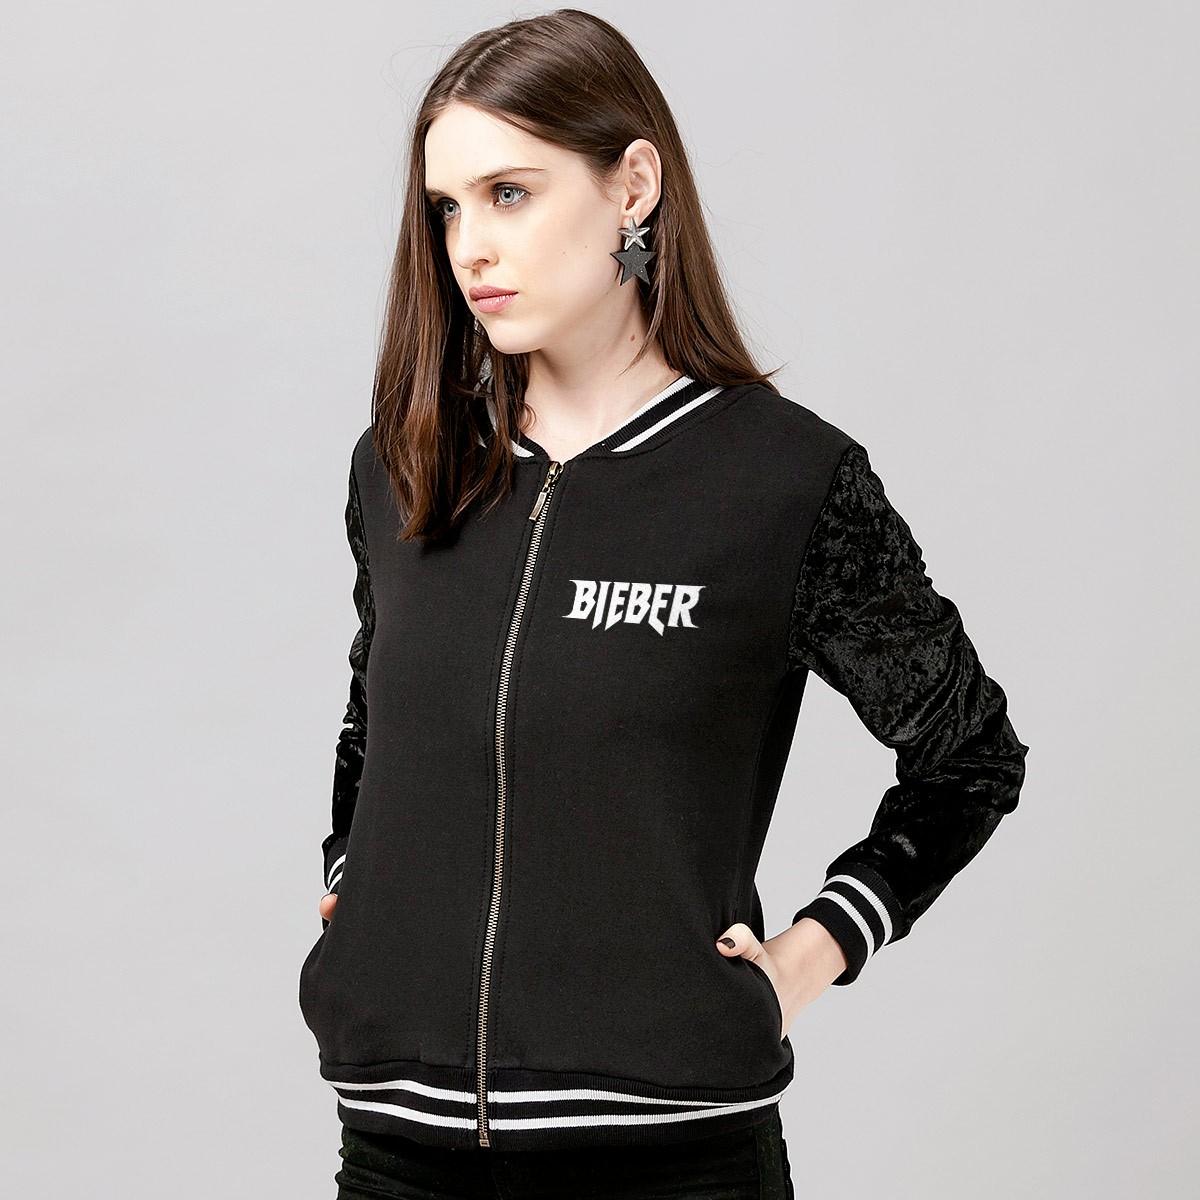 Jaqueta Veludo Justin Bieber Purpose Tour 2017